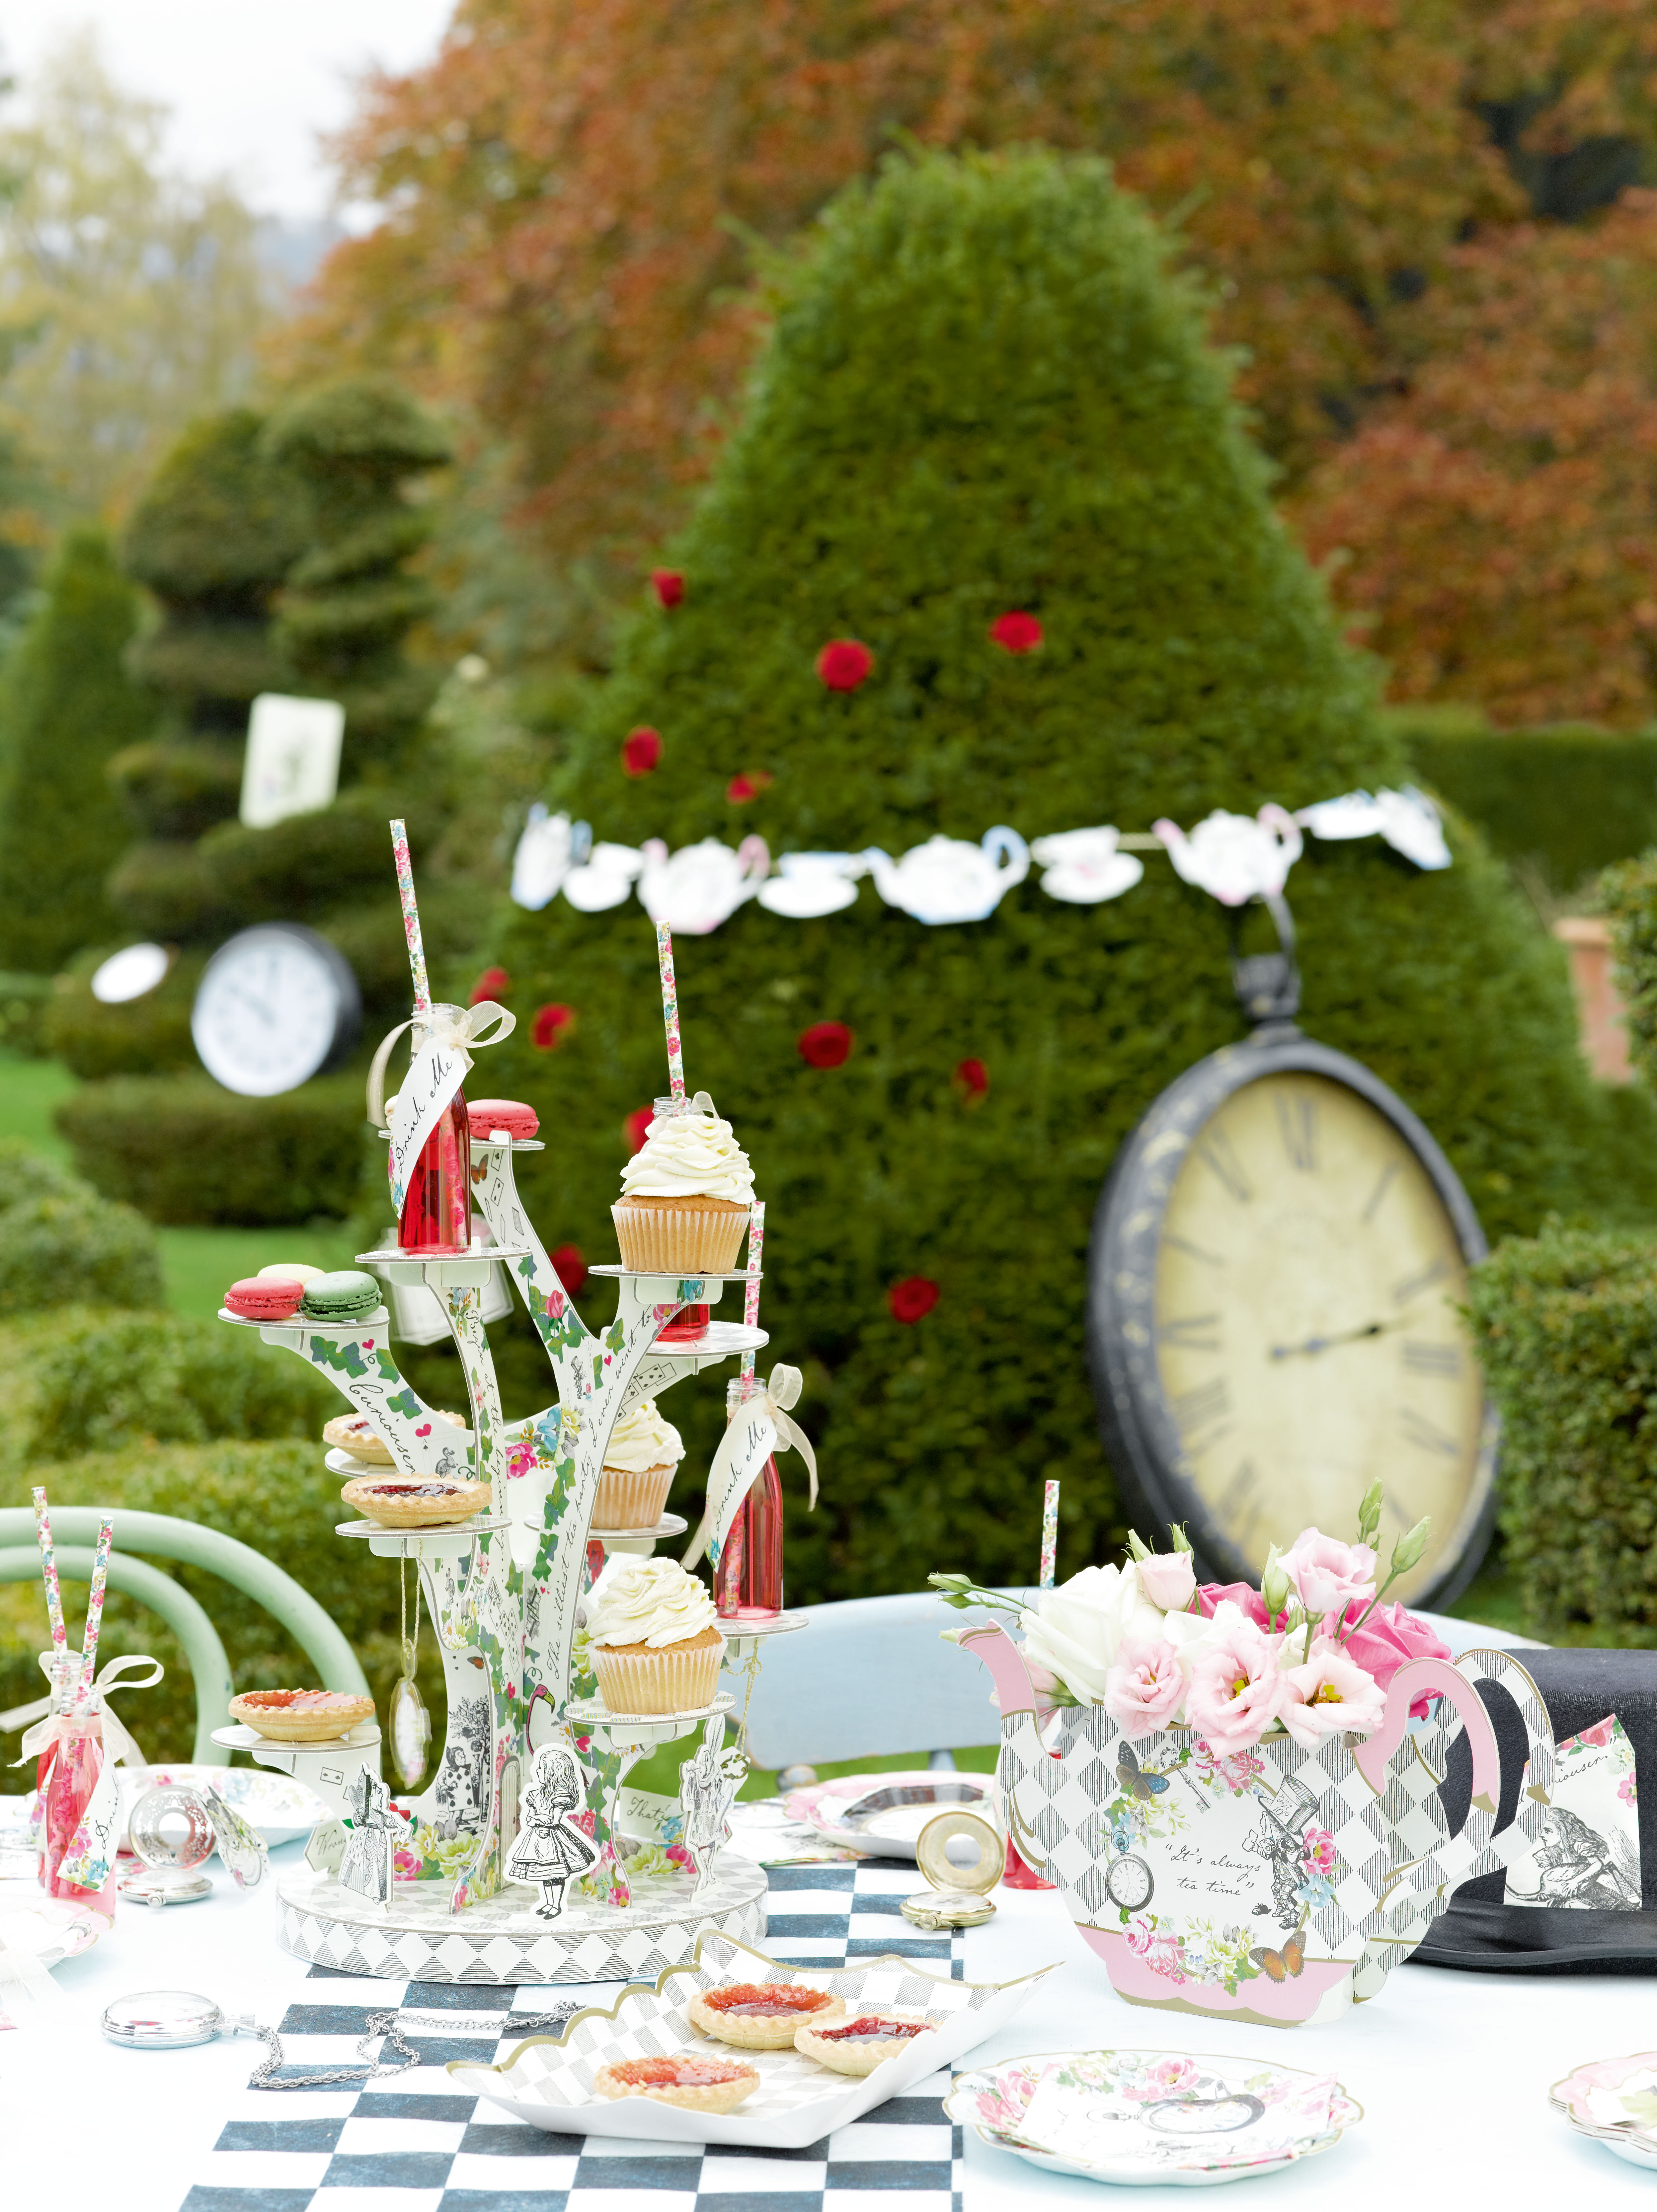 Alice im wunderland deko marry you - Alice im wunderland deko ...